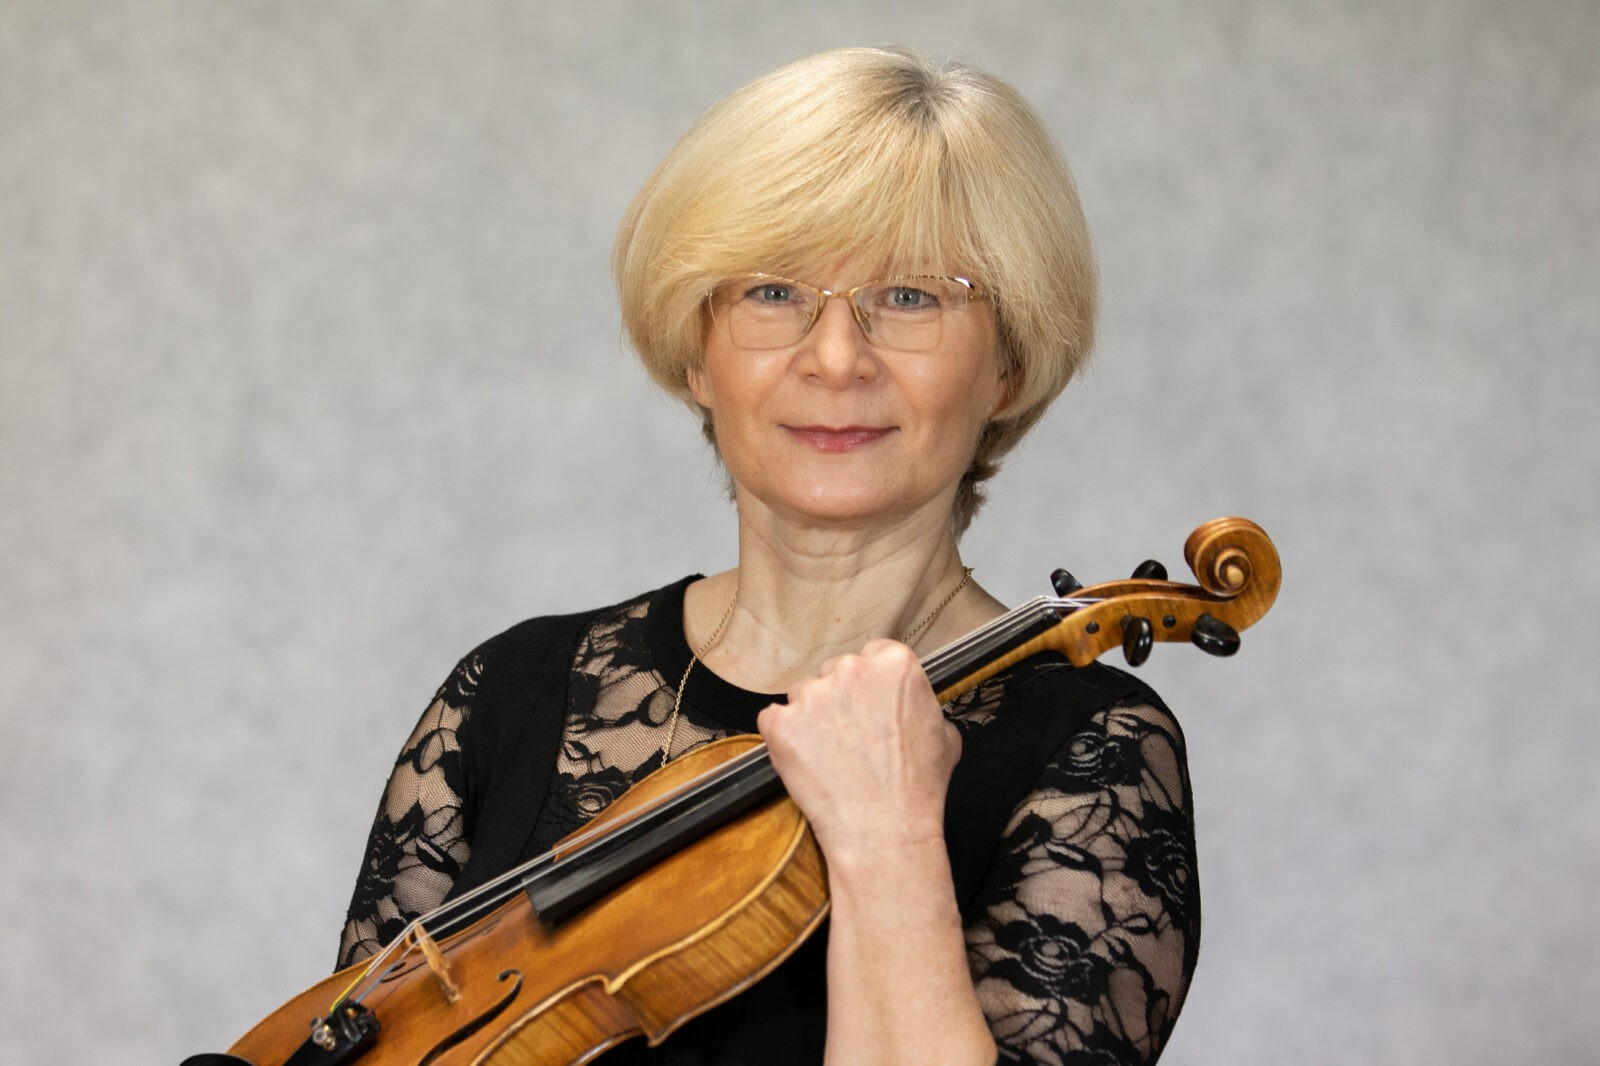 Izabela Baca